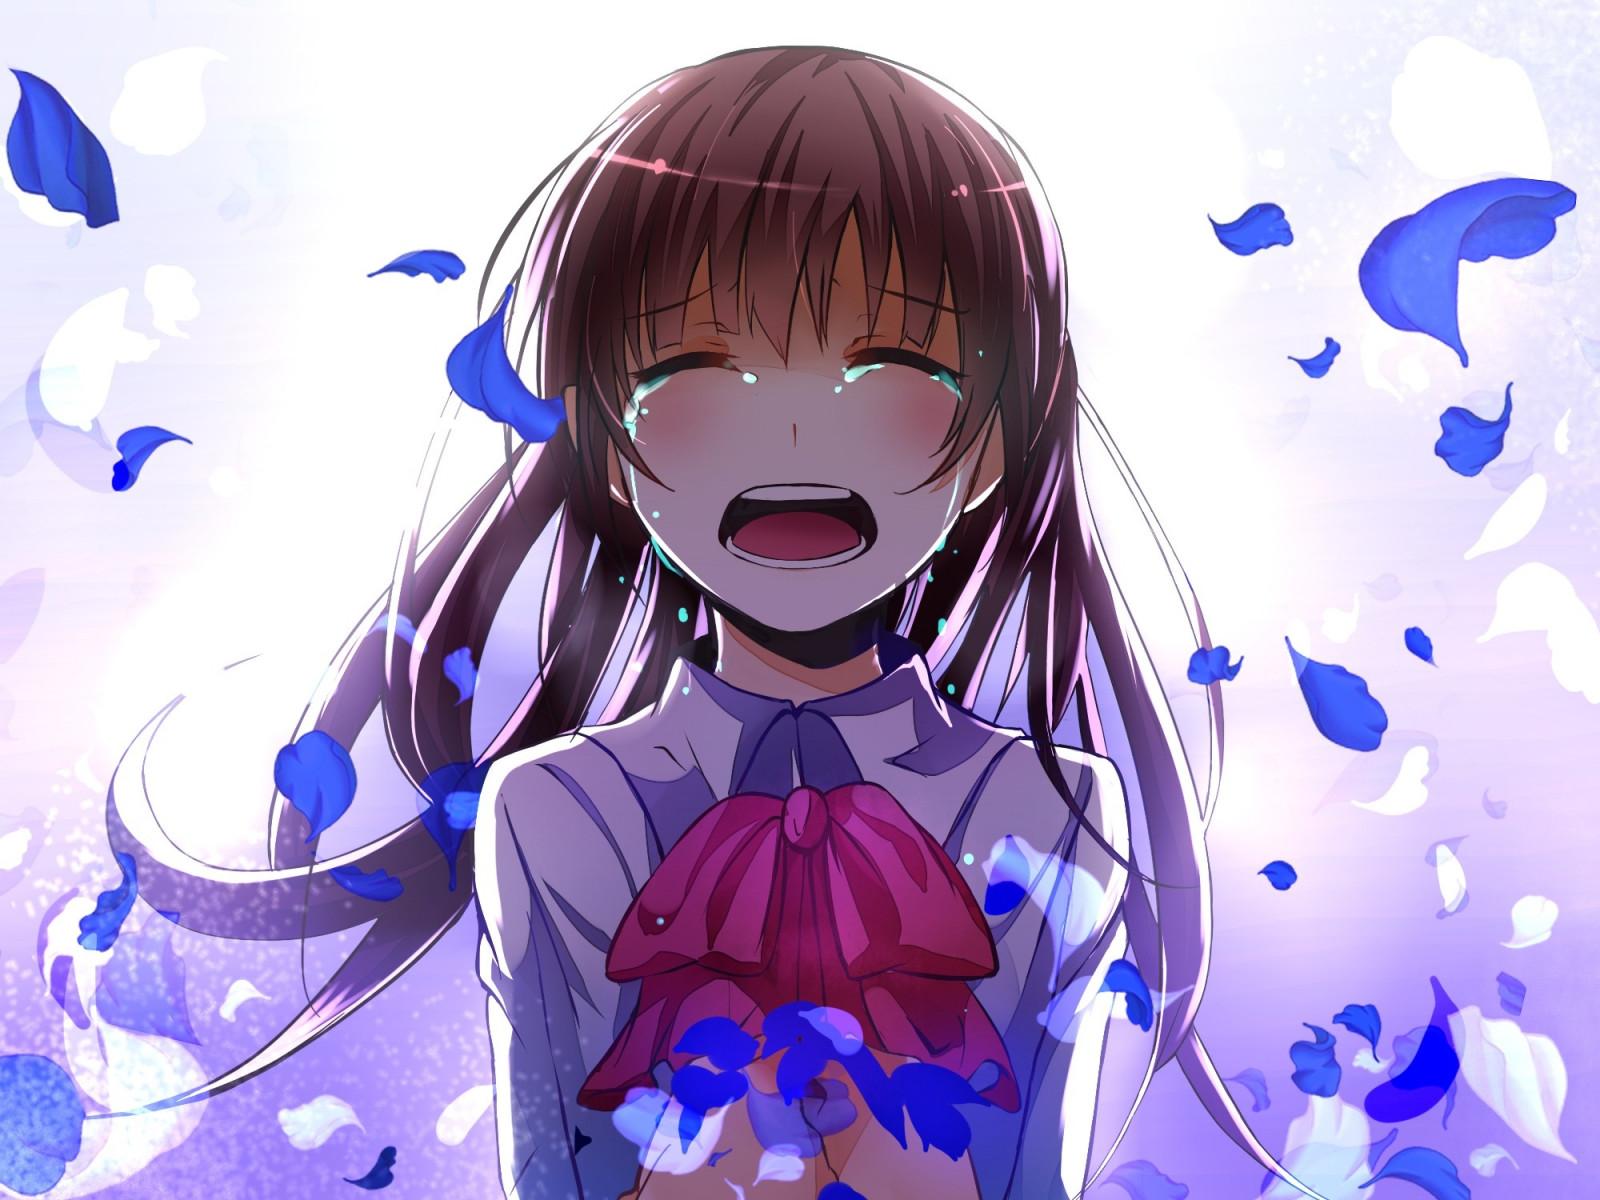 Картинки плачущей девушки аниме